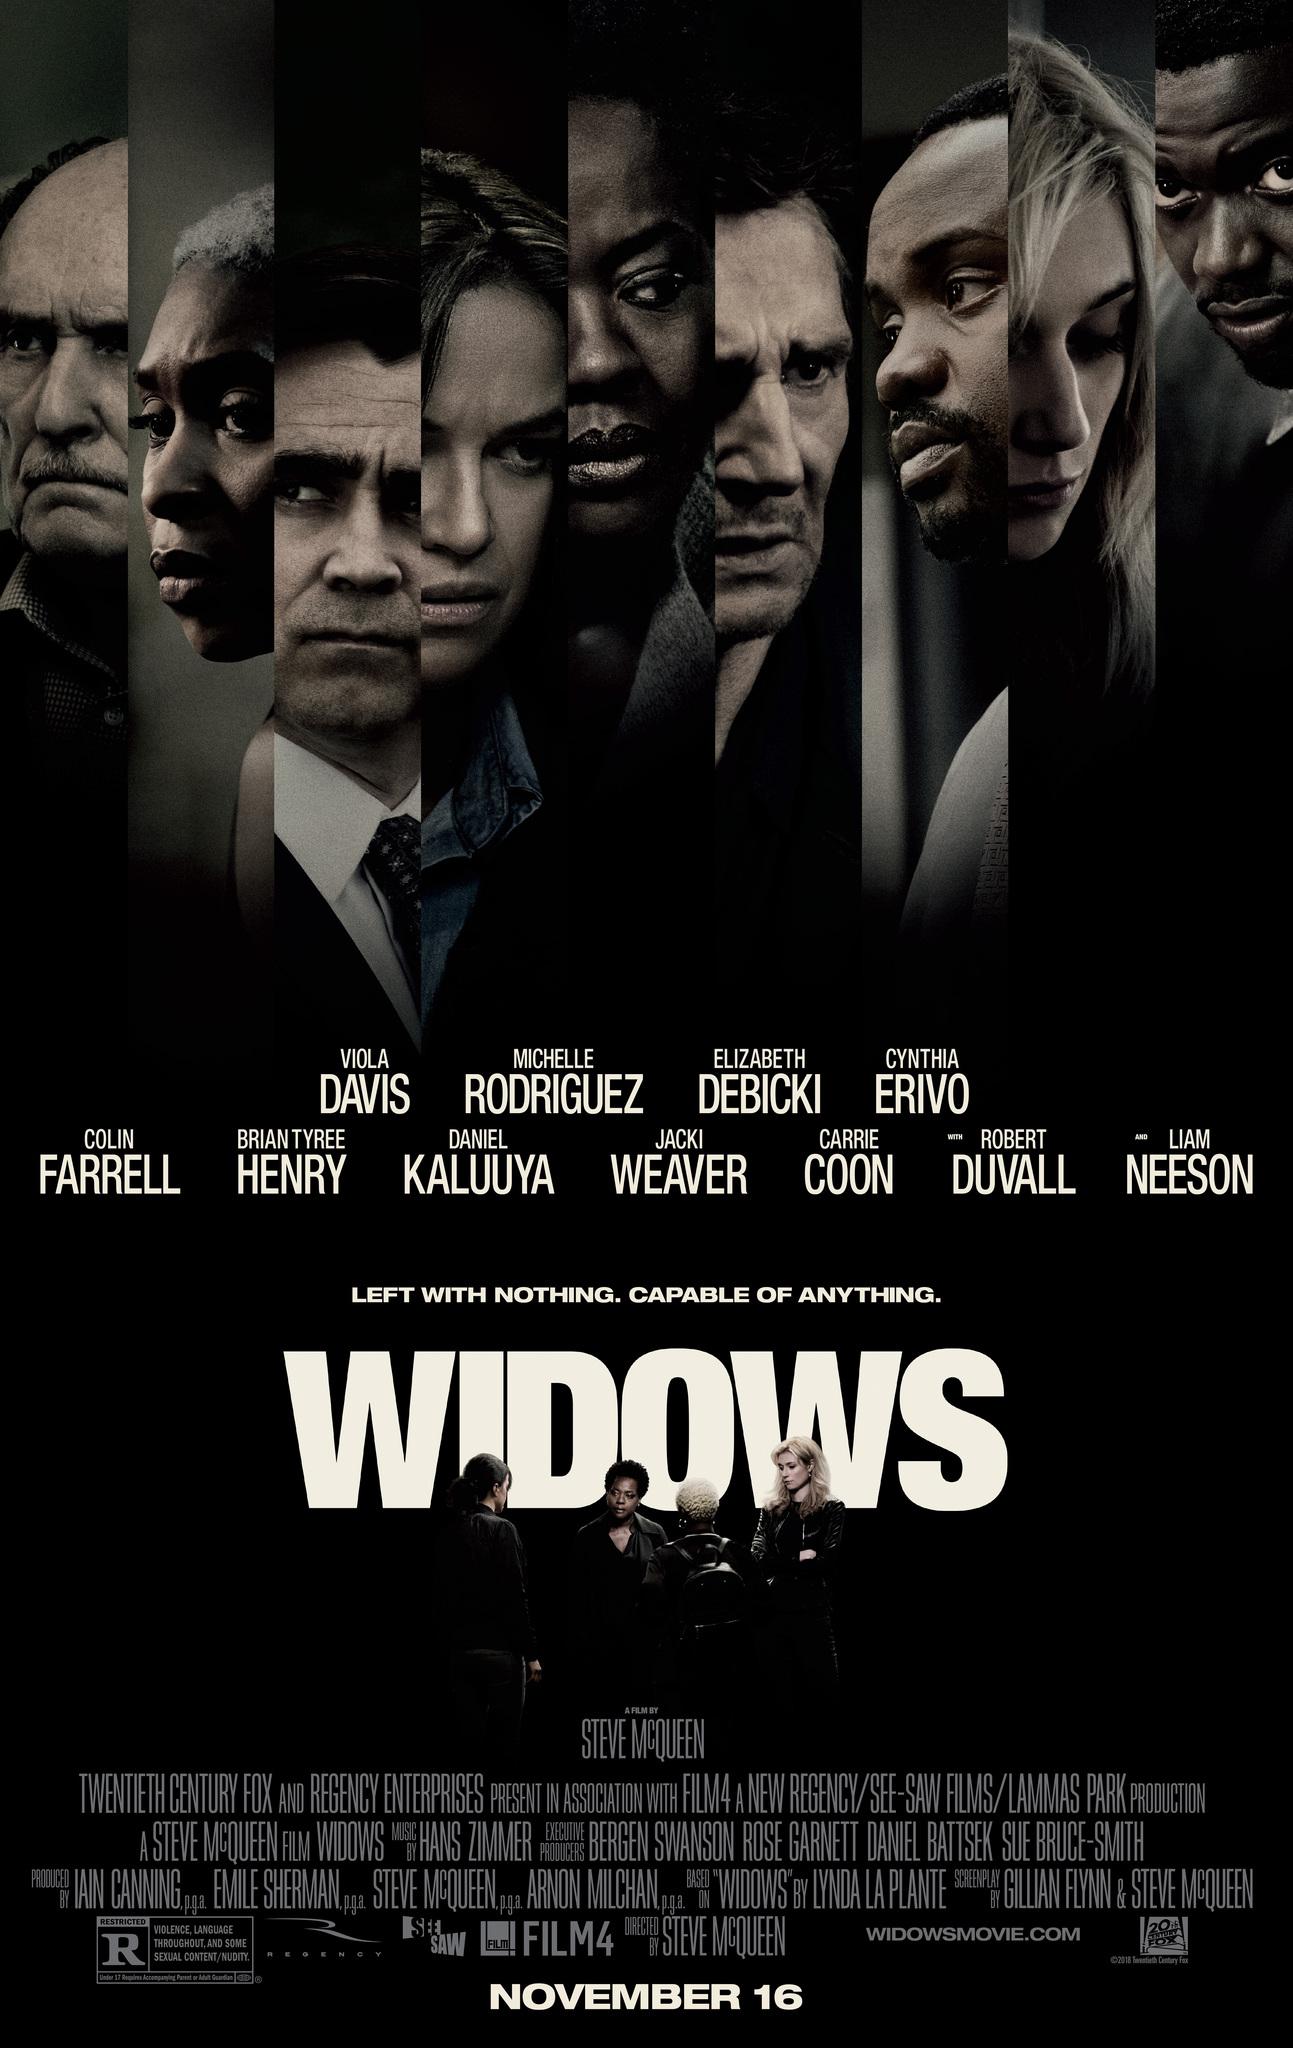 Widows - Directed by Steve McQueenWritten by Steve McQueen and Gillian Flynn based on a book by Lynda La PlanteWith Viola Davis, Liam Neeson, Elizabeth Debicki…